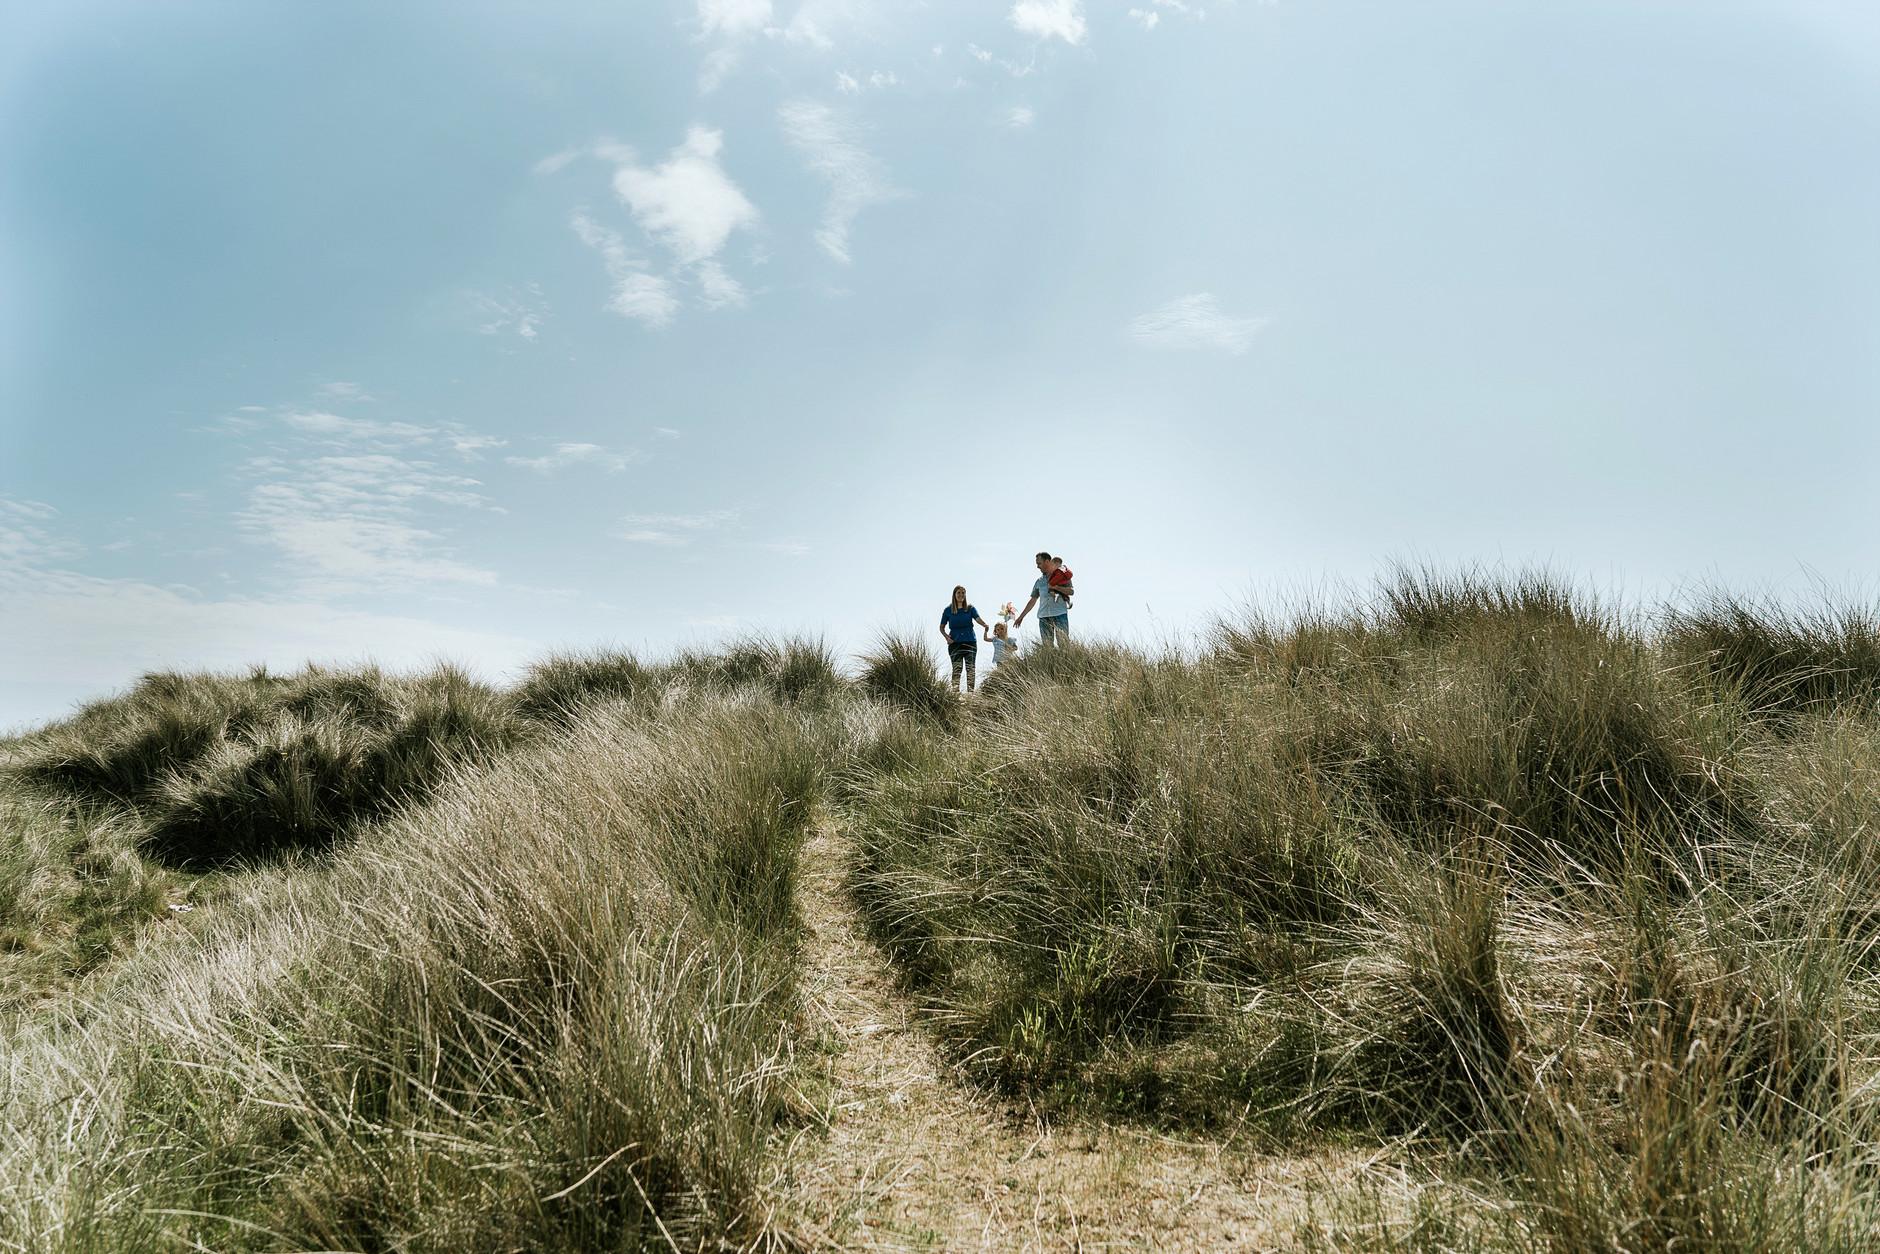 Family of four walking in the sand dunes in Bull Island, Dublin